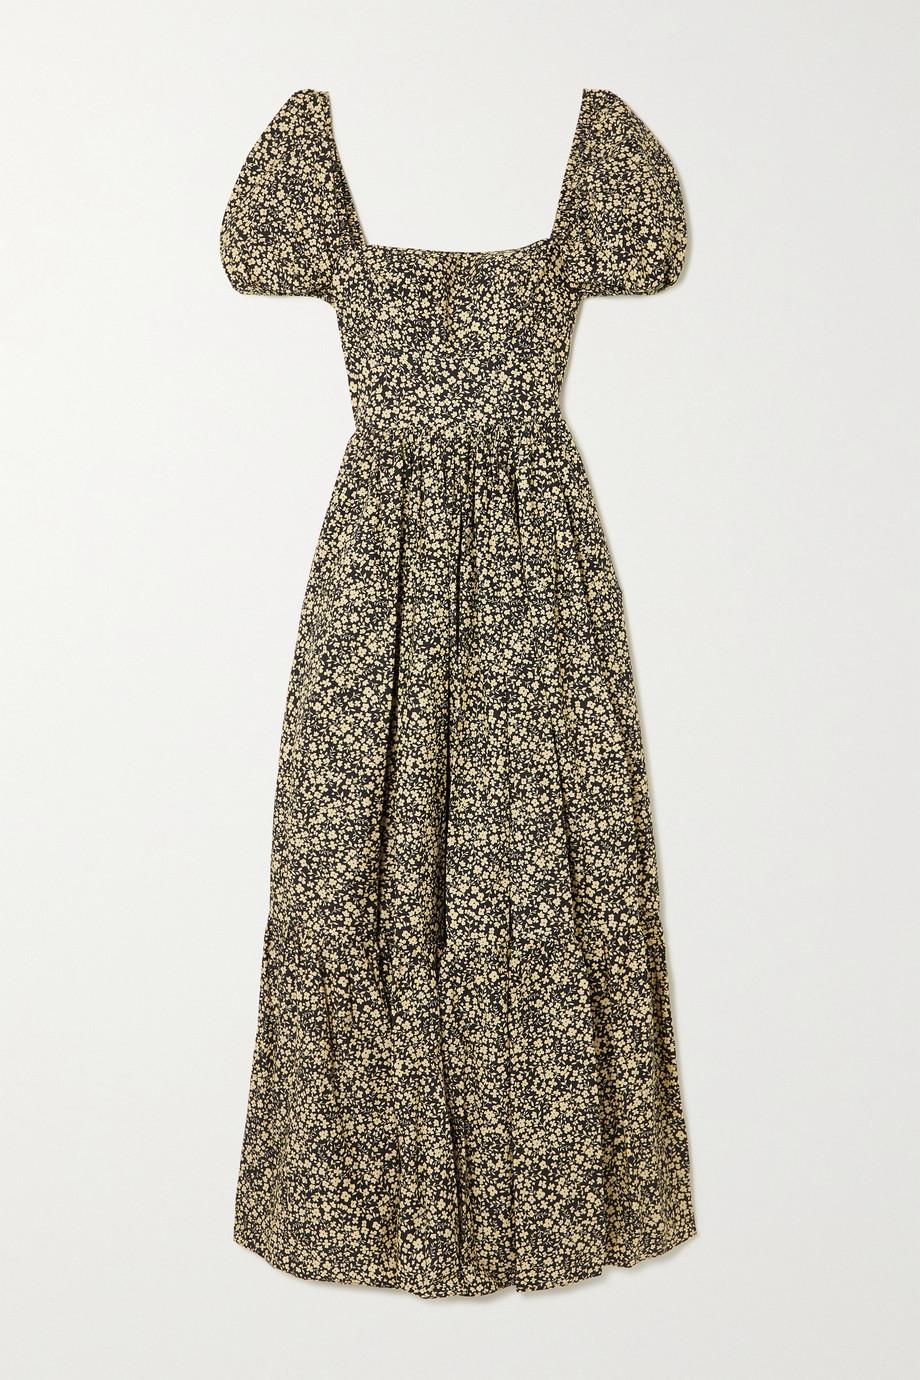 Matteau + NET SUSTAIN floral-print organic cotton-poplin maxi dress